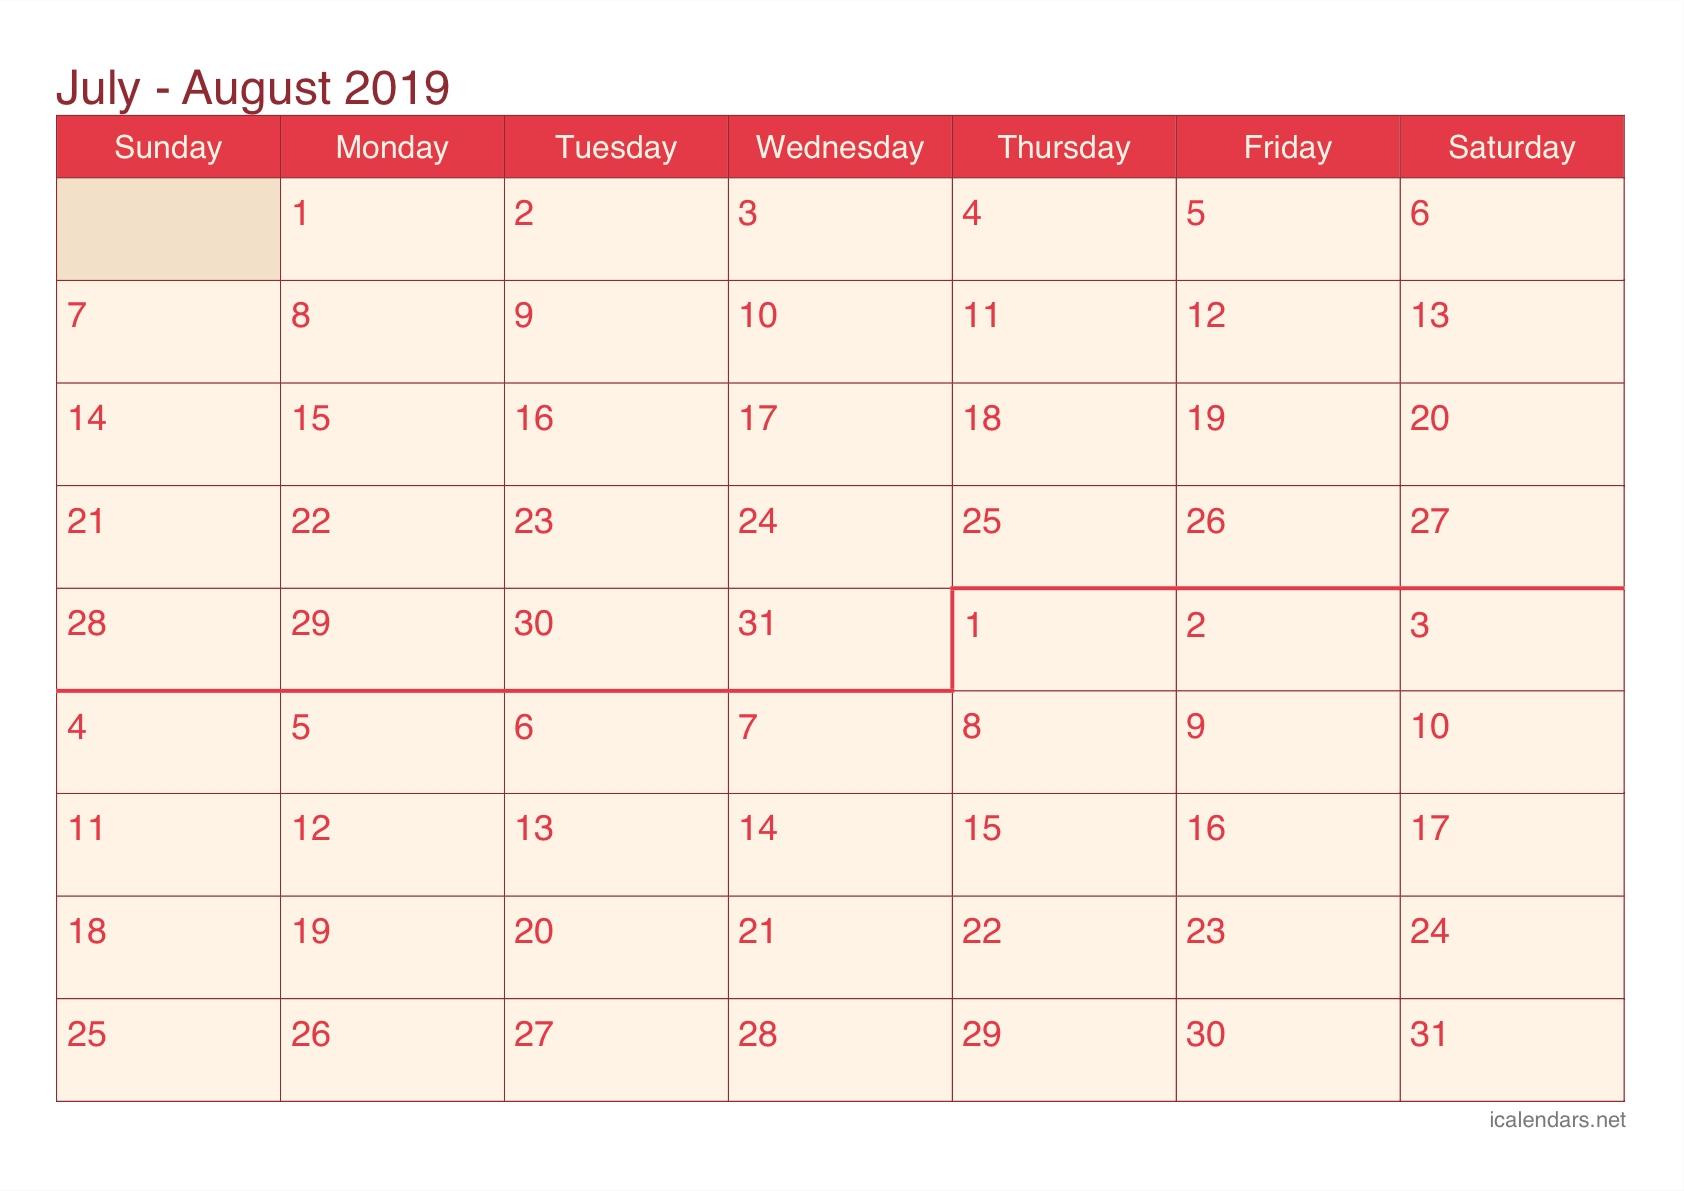 July And August 2019 Printable Calendar - Icalendars-June July & August Blank Calendar